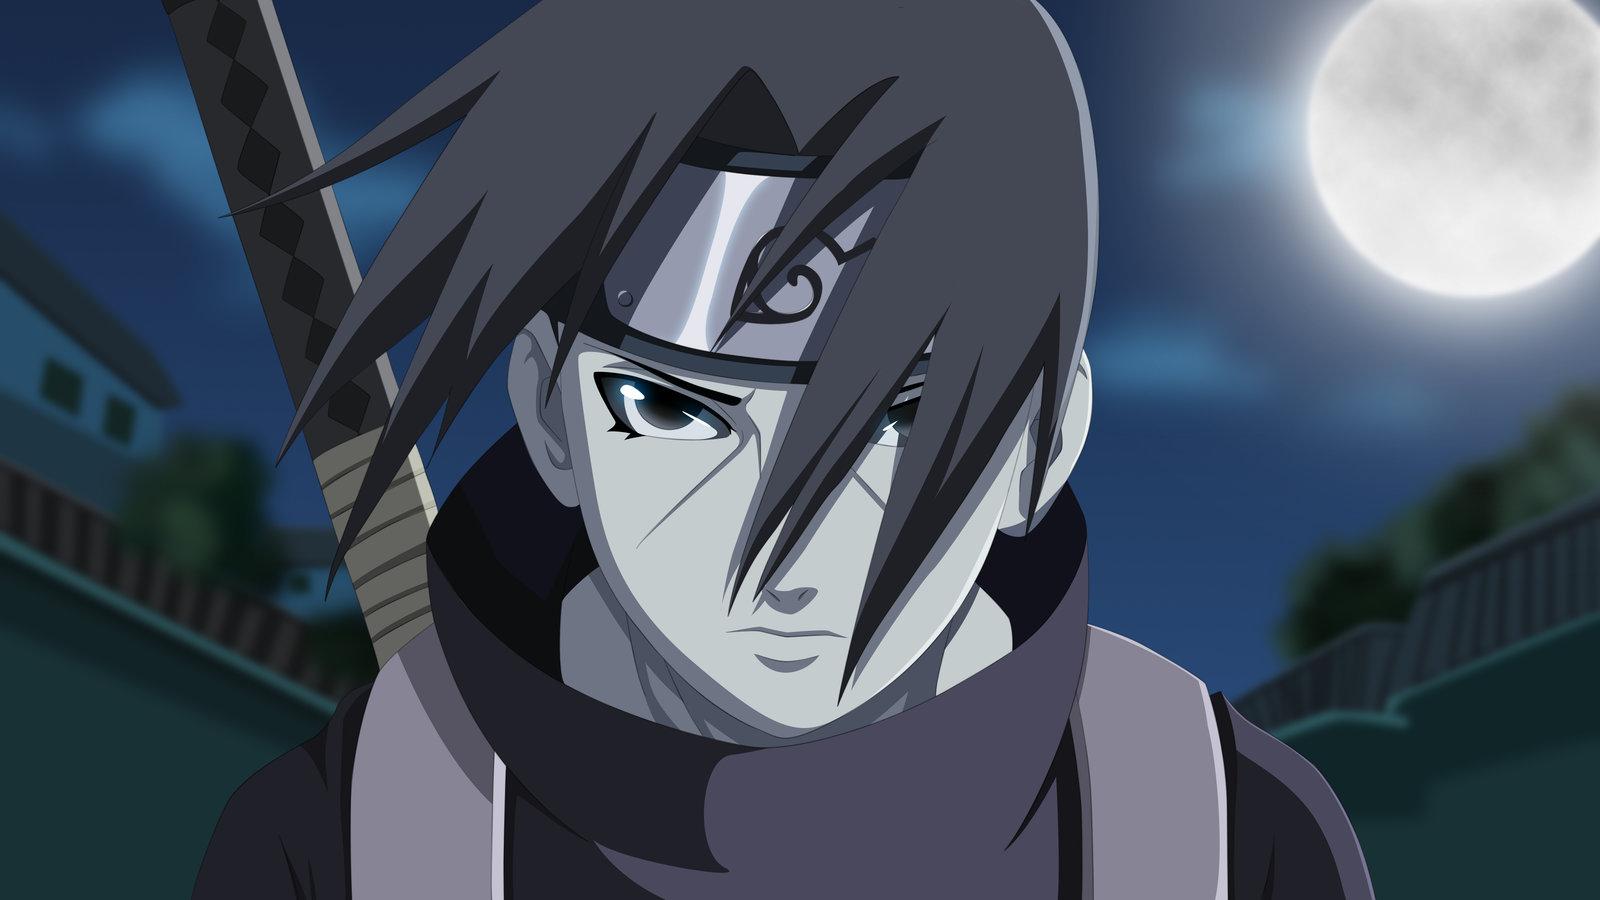 5 Anggota Klan Uchiha Terkuat Sepanjang Sejarah Dunia Shinobi 6